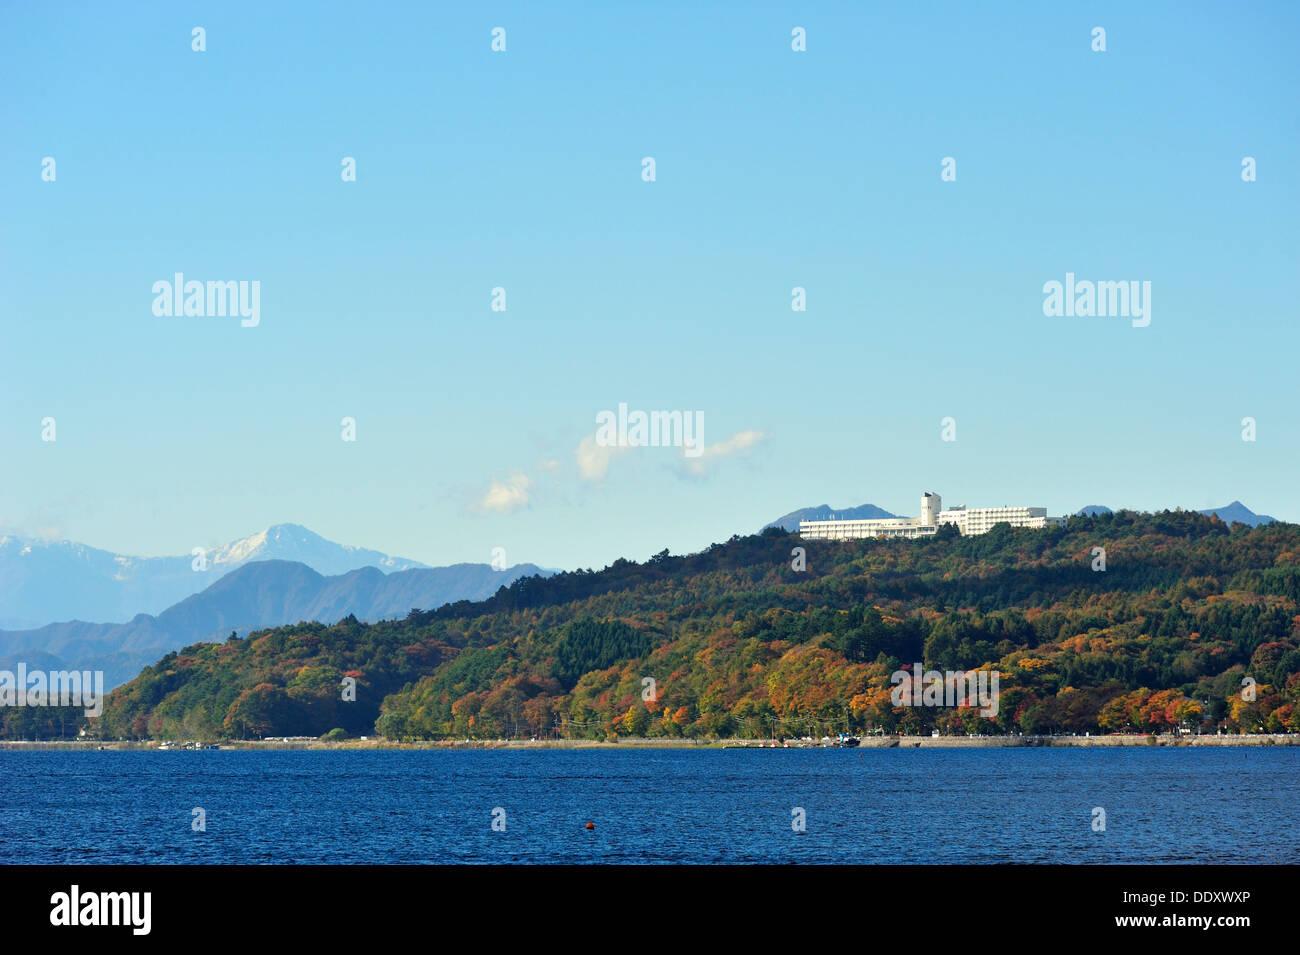 Lake Yamanaka, Kanagawa Prefecture Japan Stock Photo